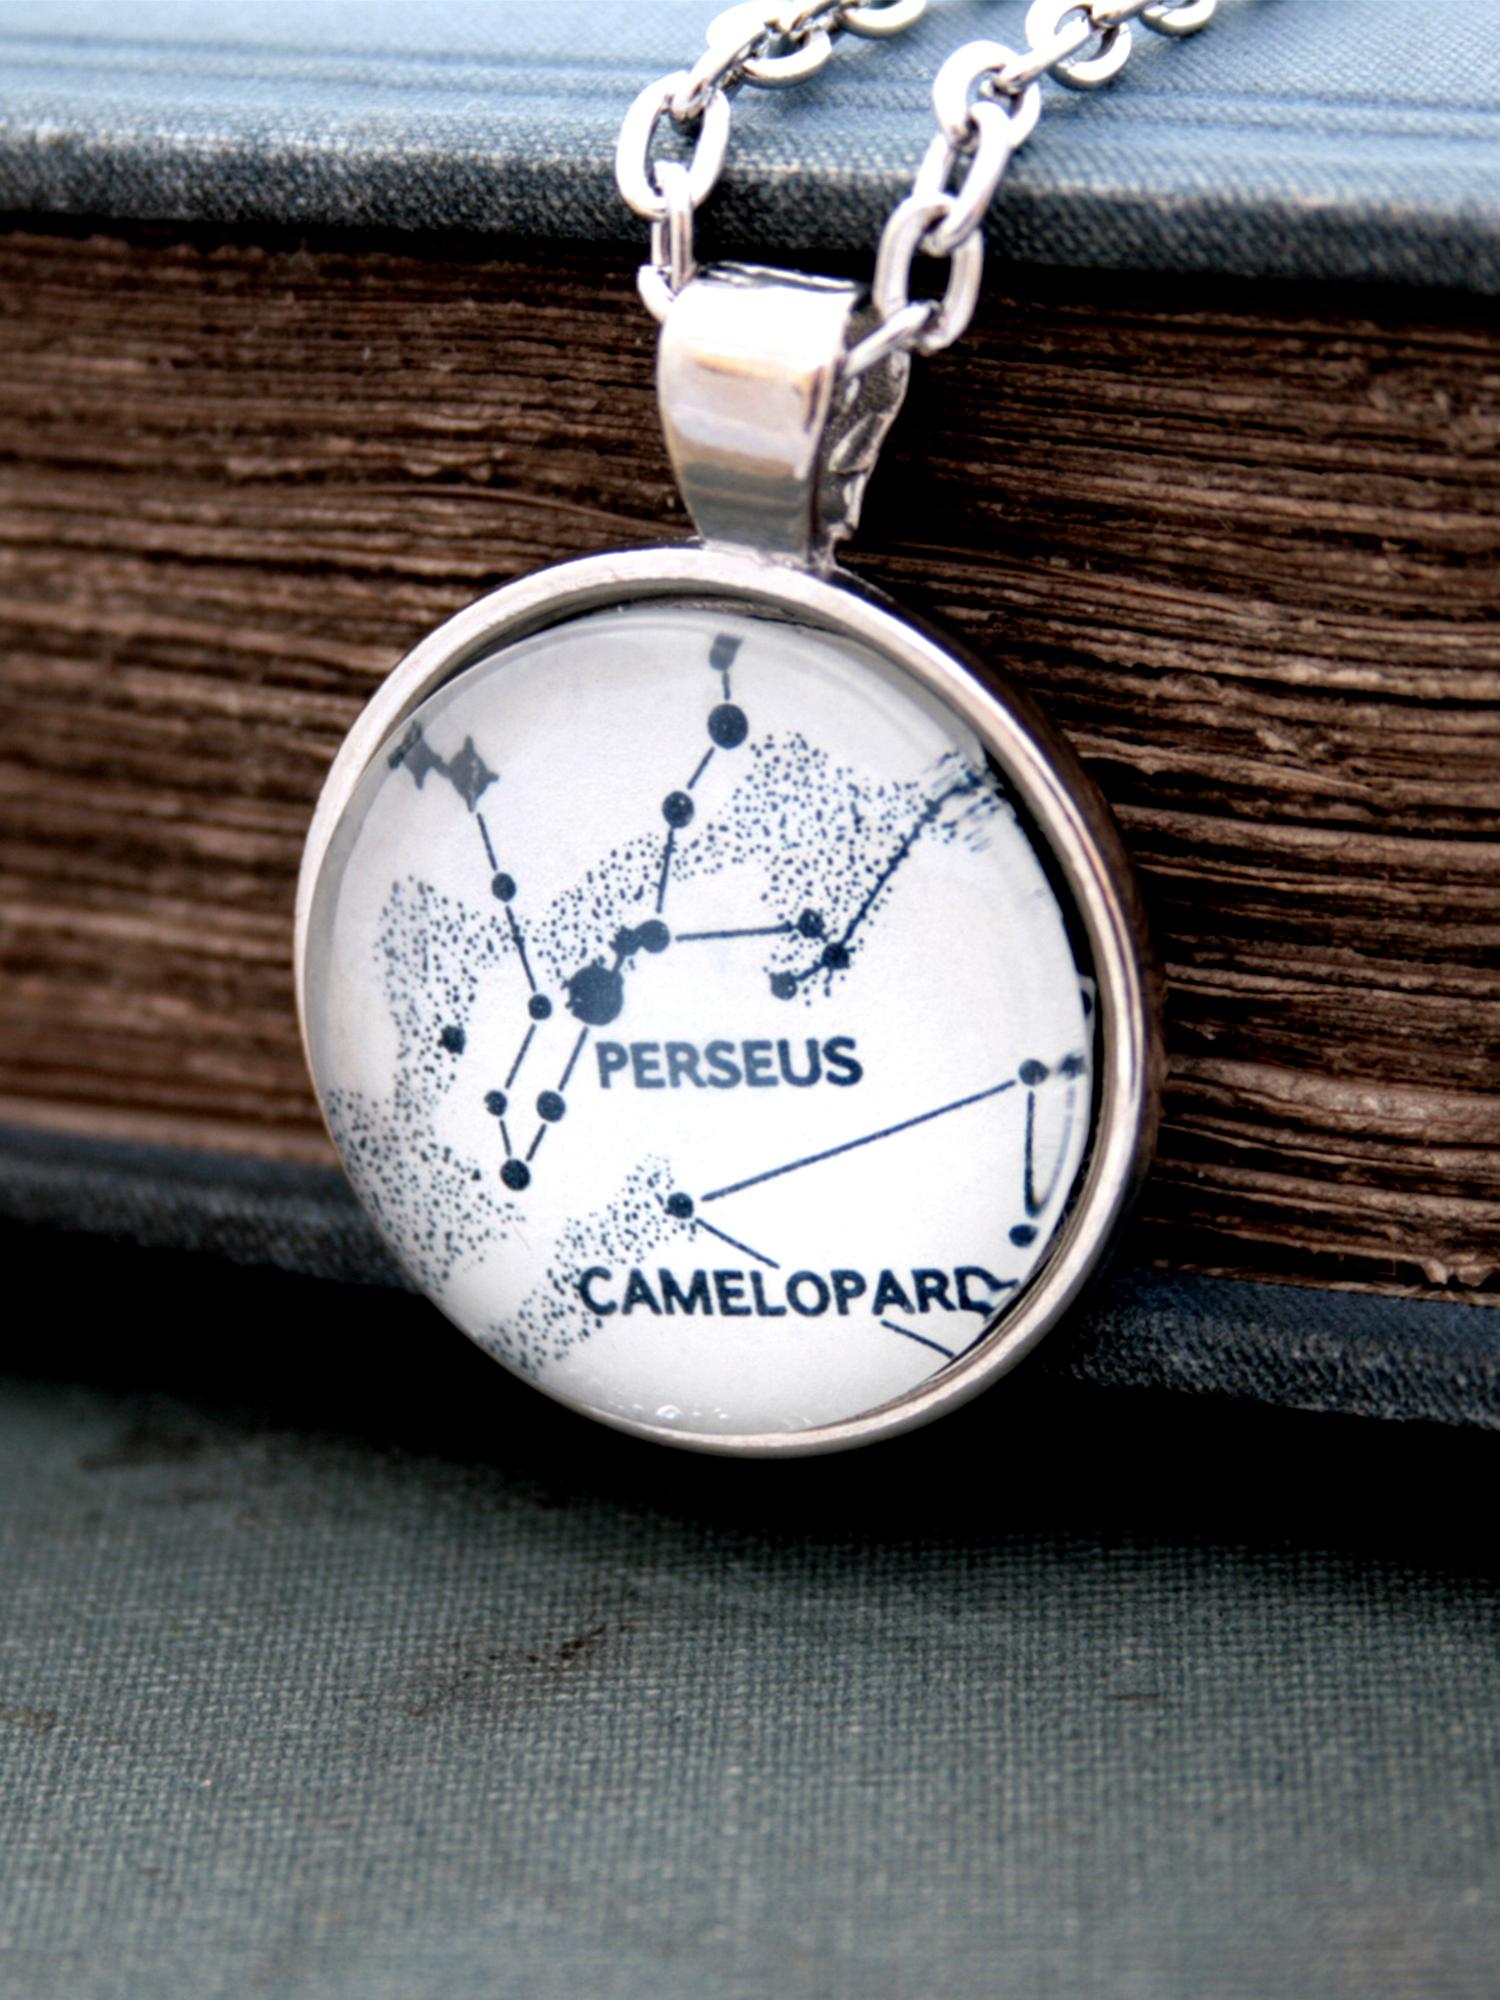 Perseus constellation.jpg